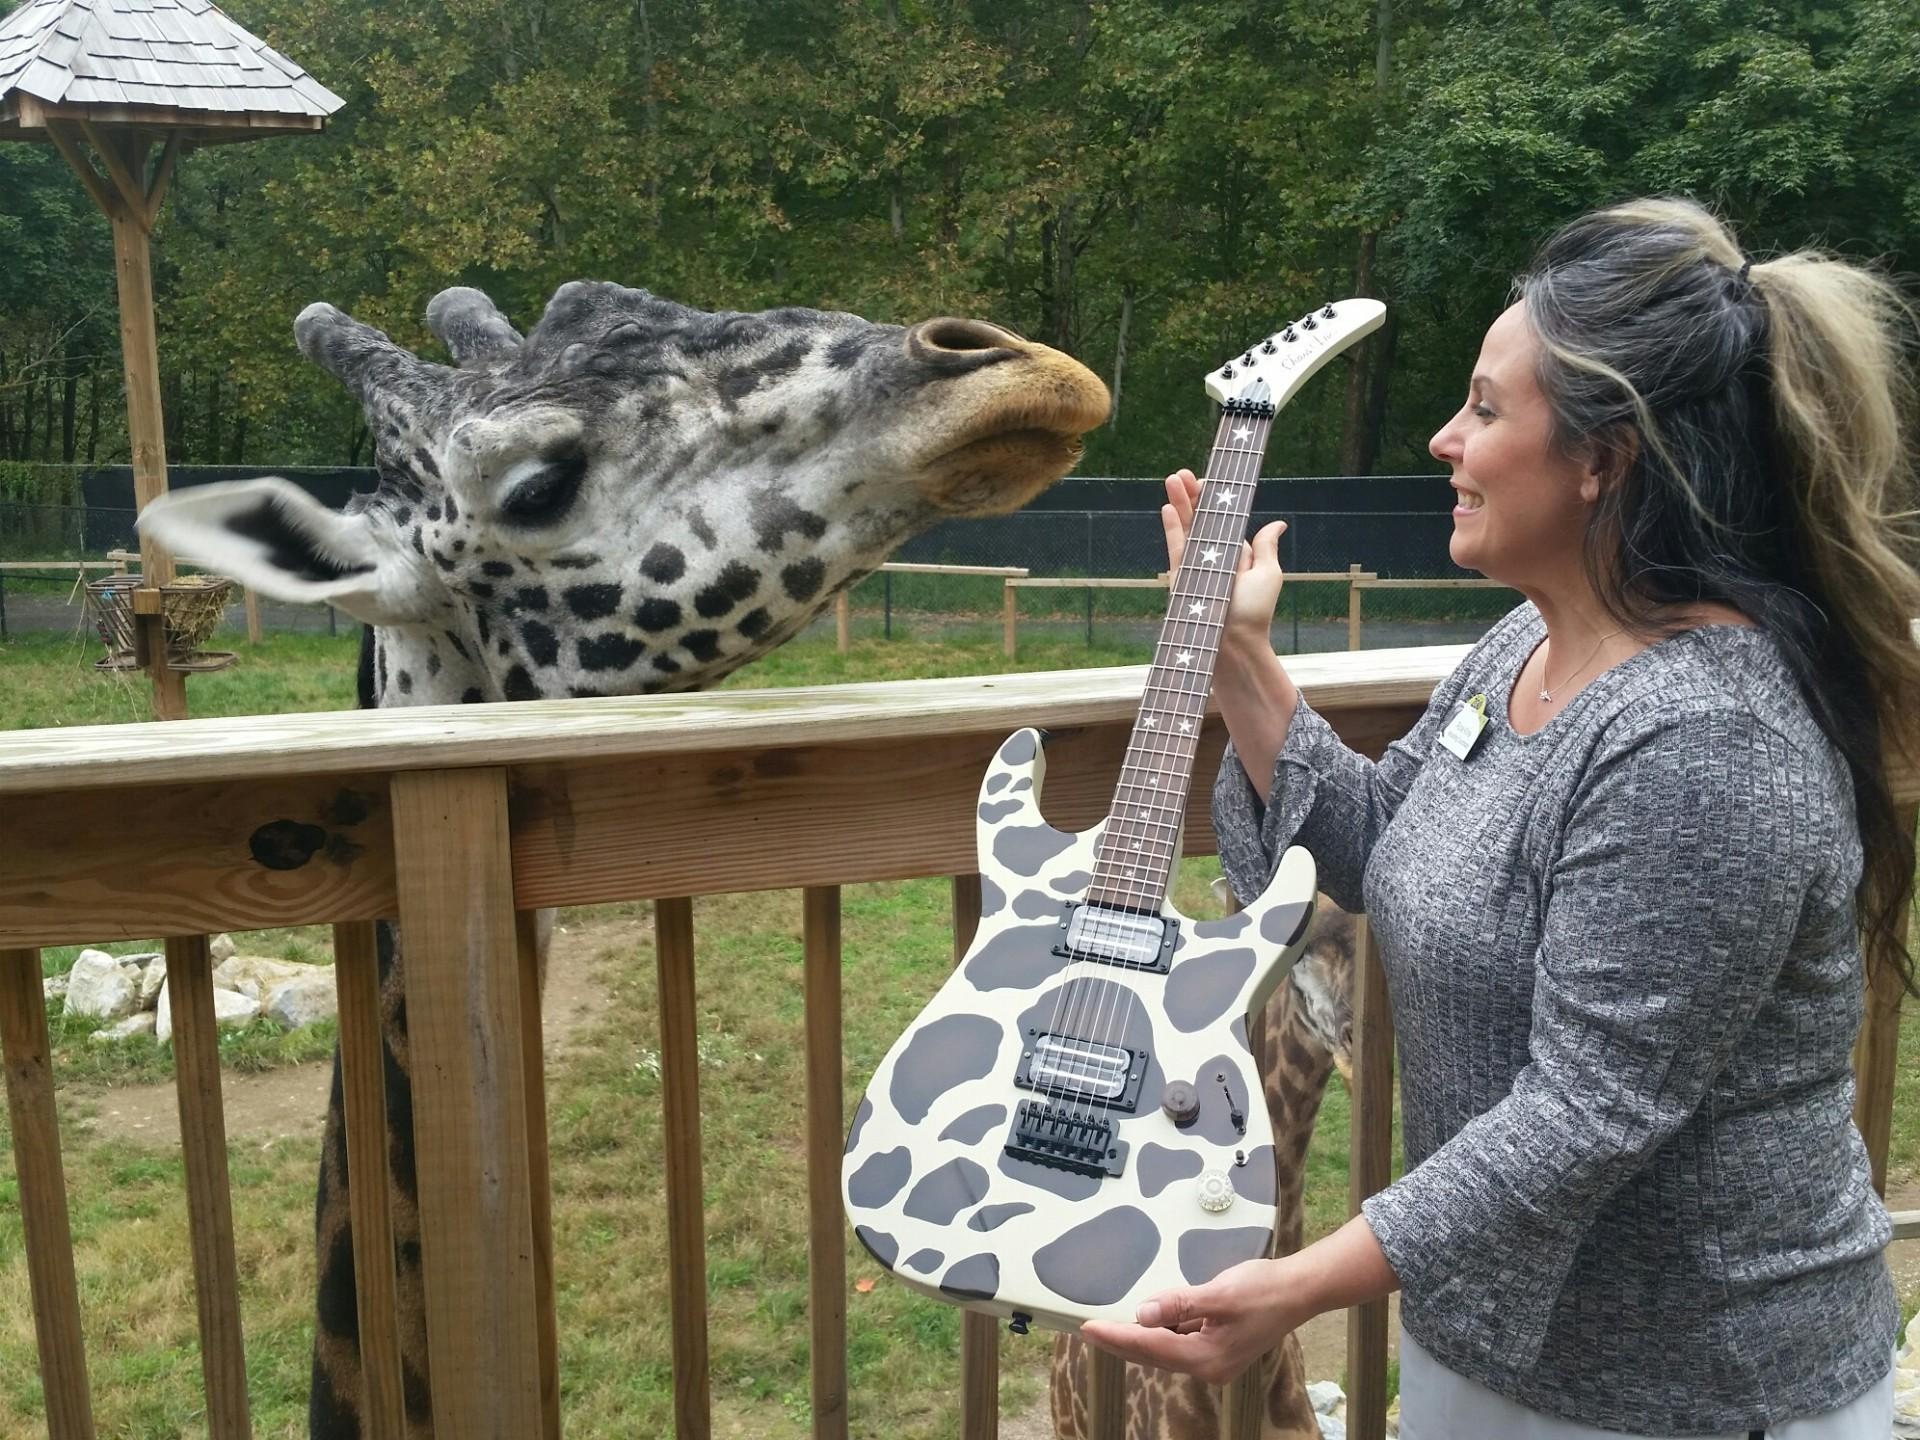 lehigh valley zoo, giraffe, guitar, chaos guitars, chaos inc